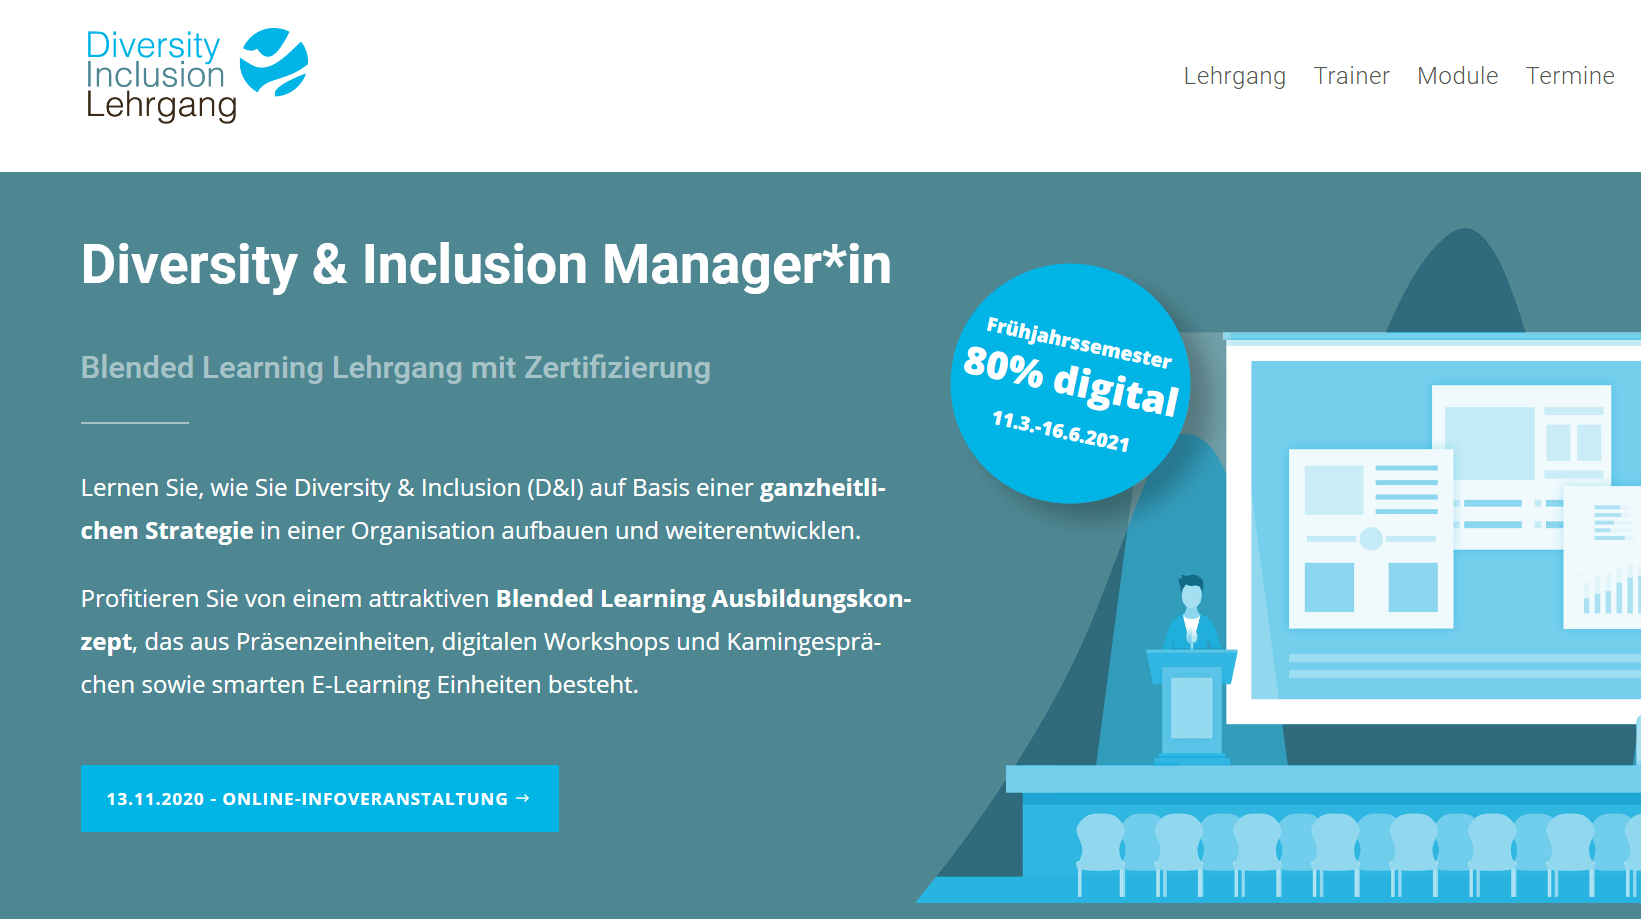 Diversity Lehrgang Website